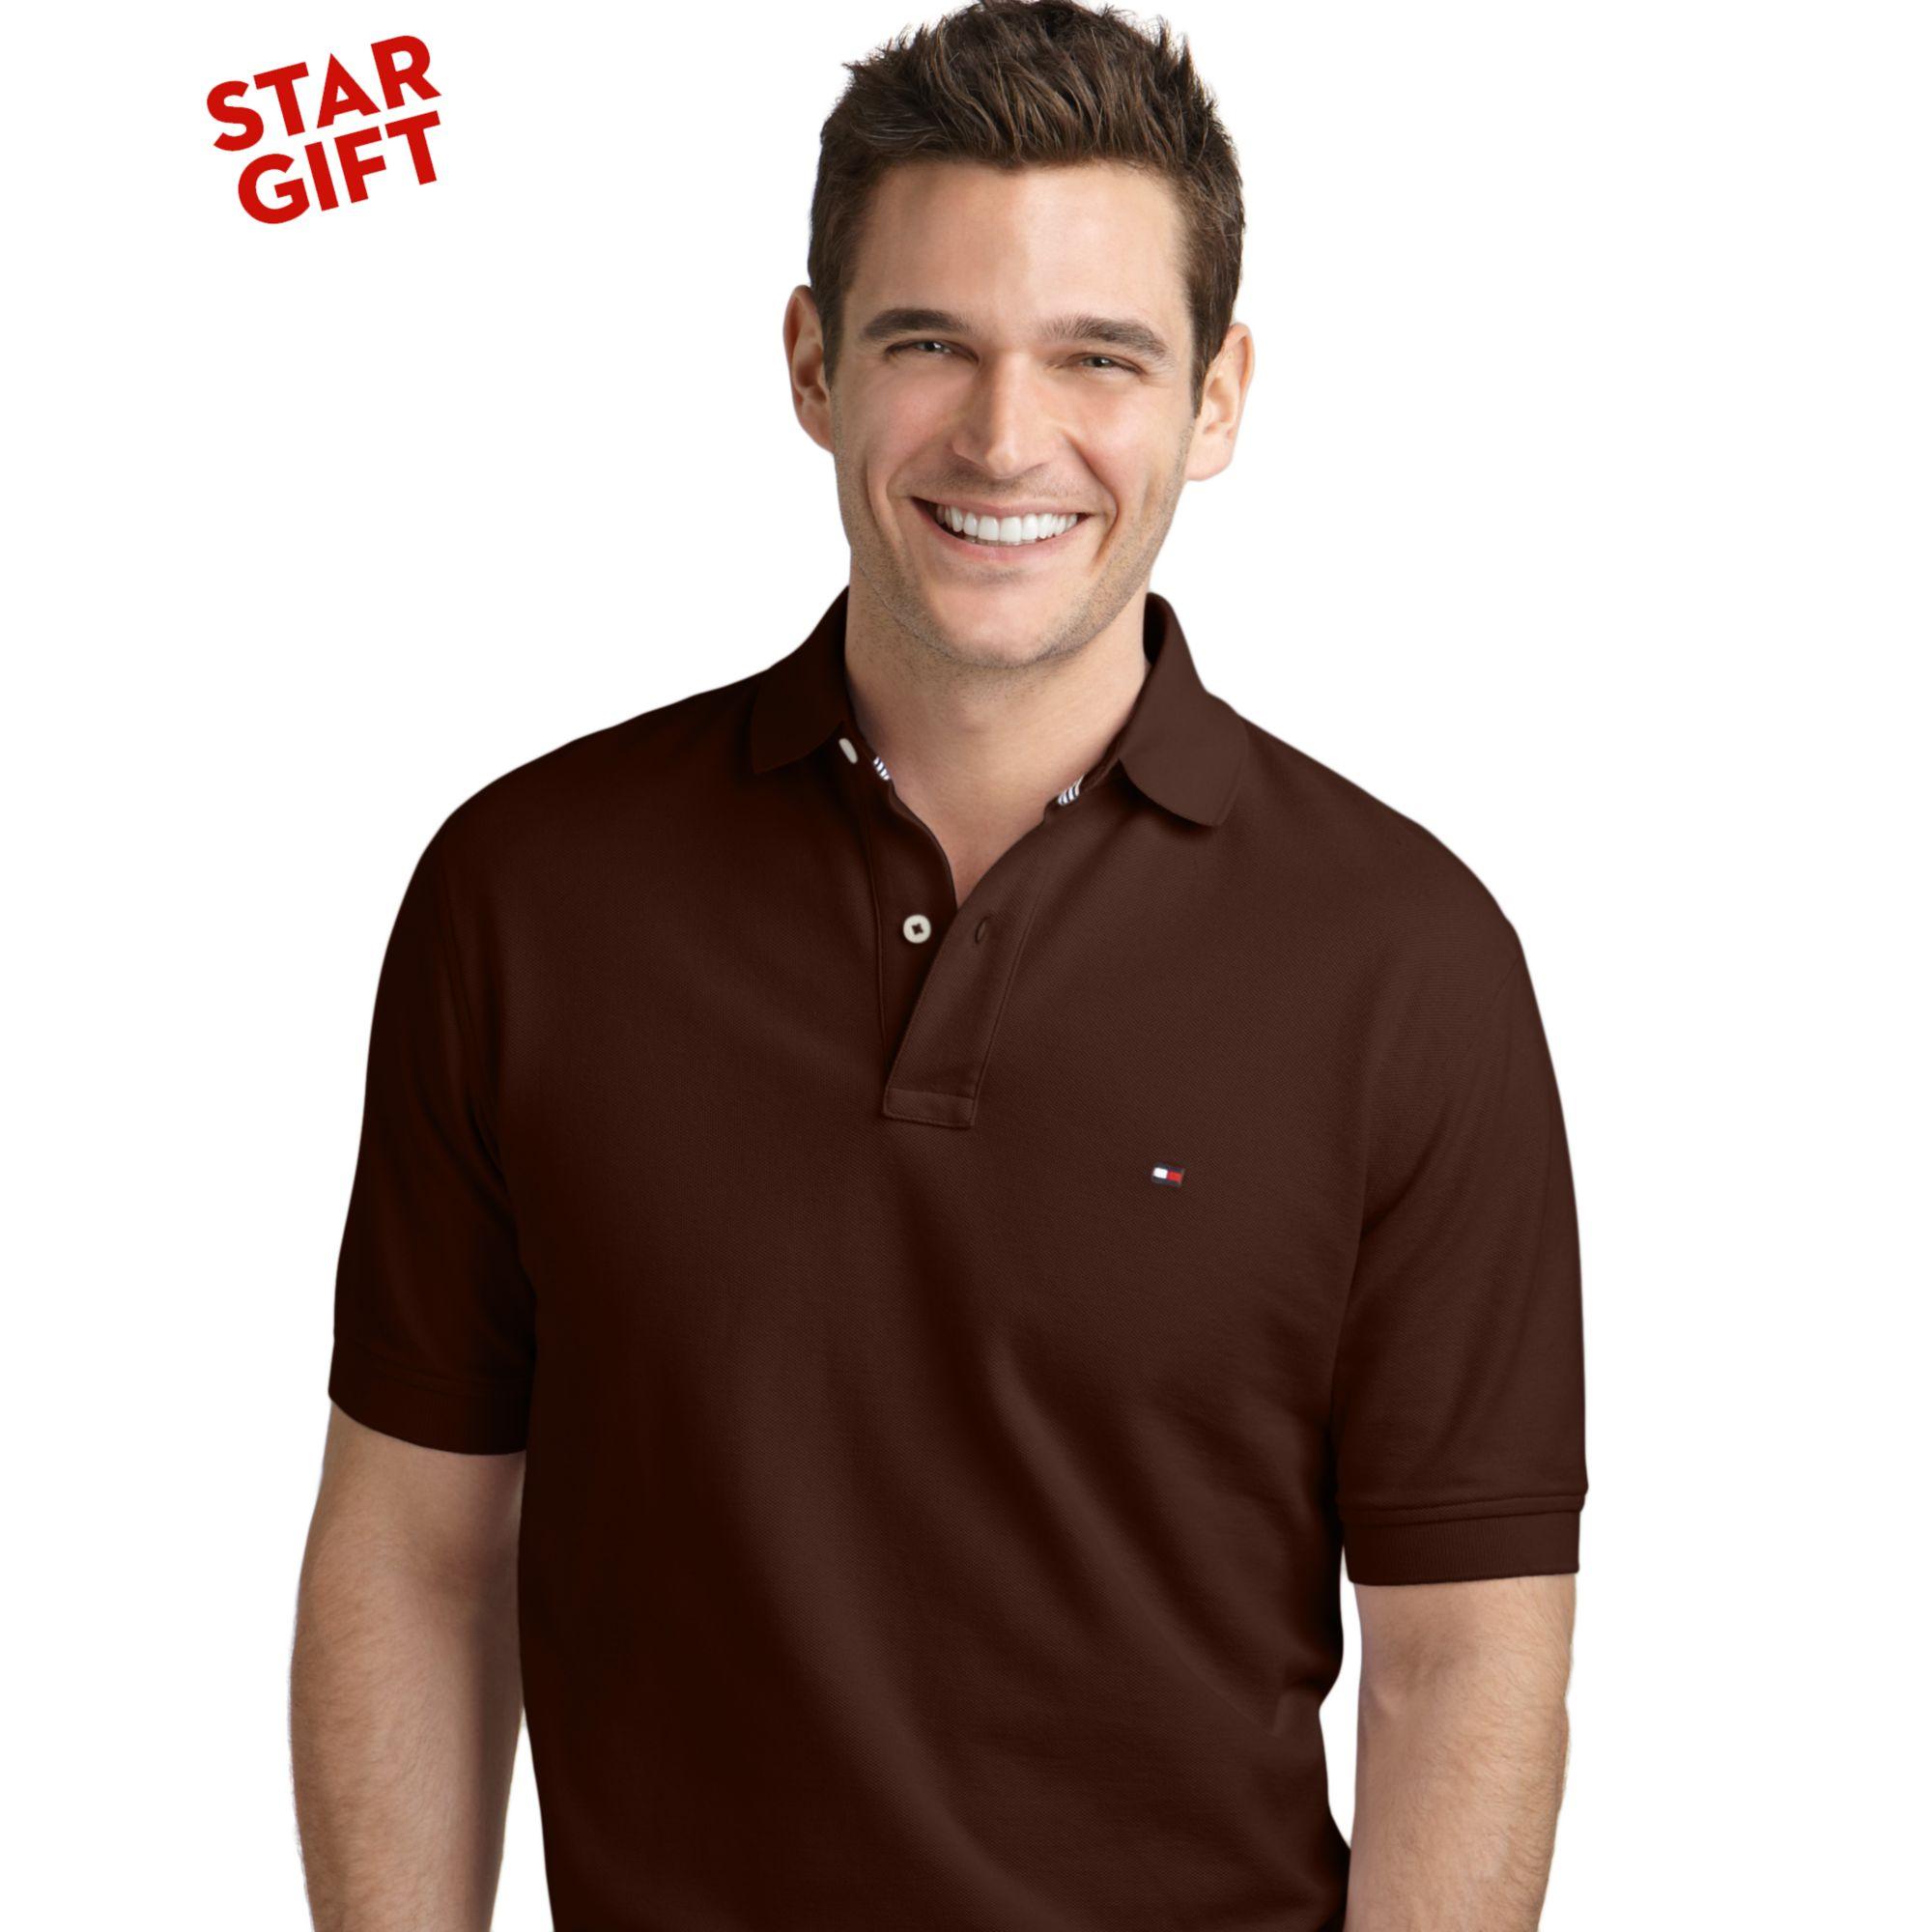 tommy hilfiger ivy polo shirt in brown for men lyst. Black Bedroom Furniture Sets. Home Design Ideas